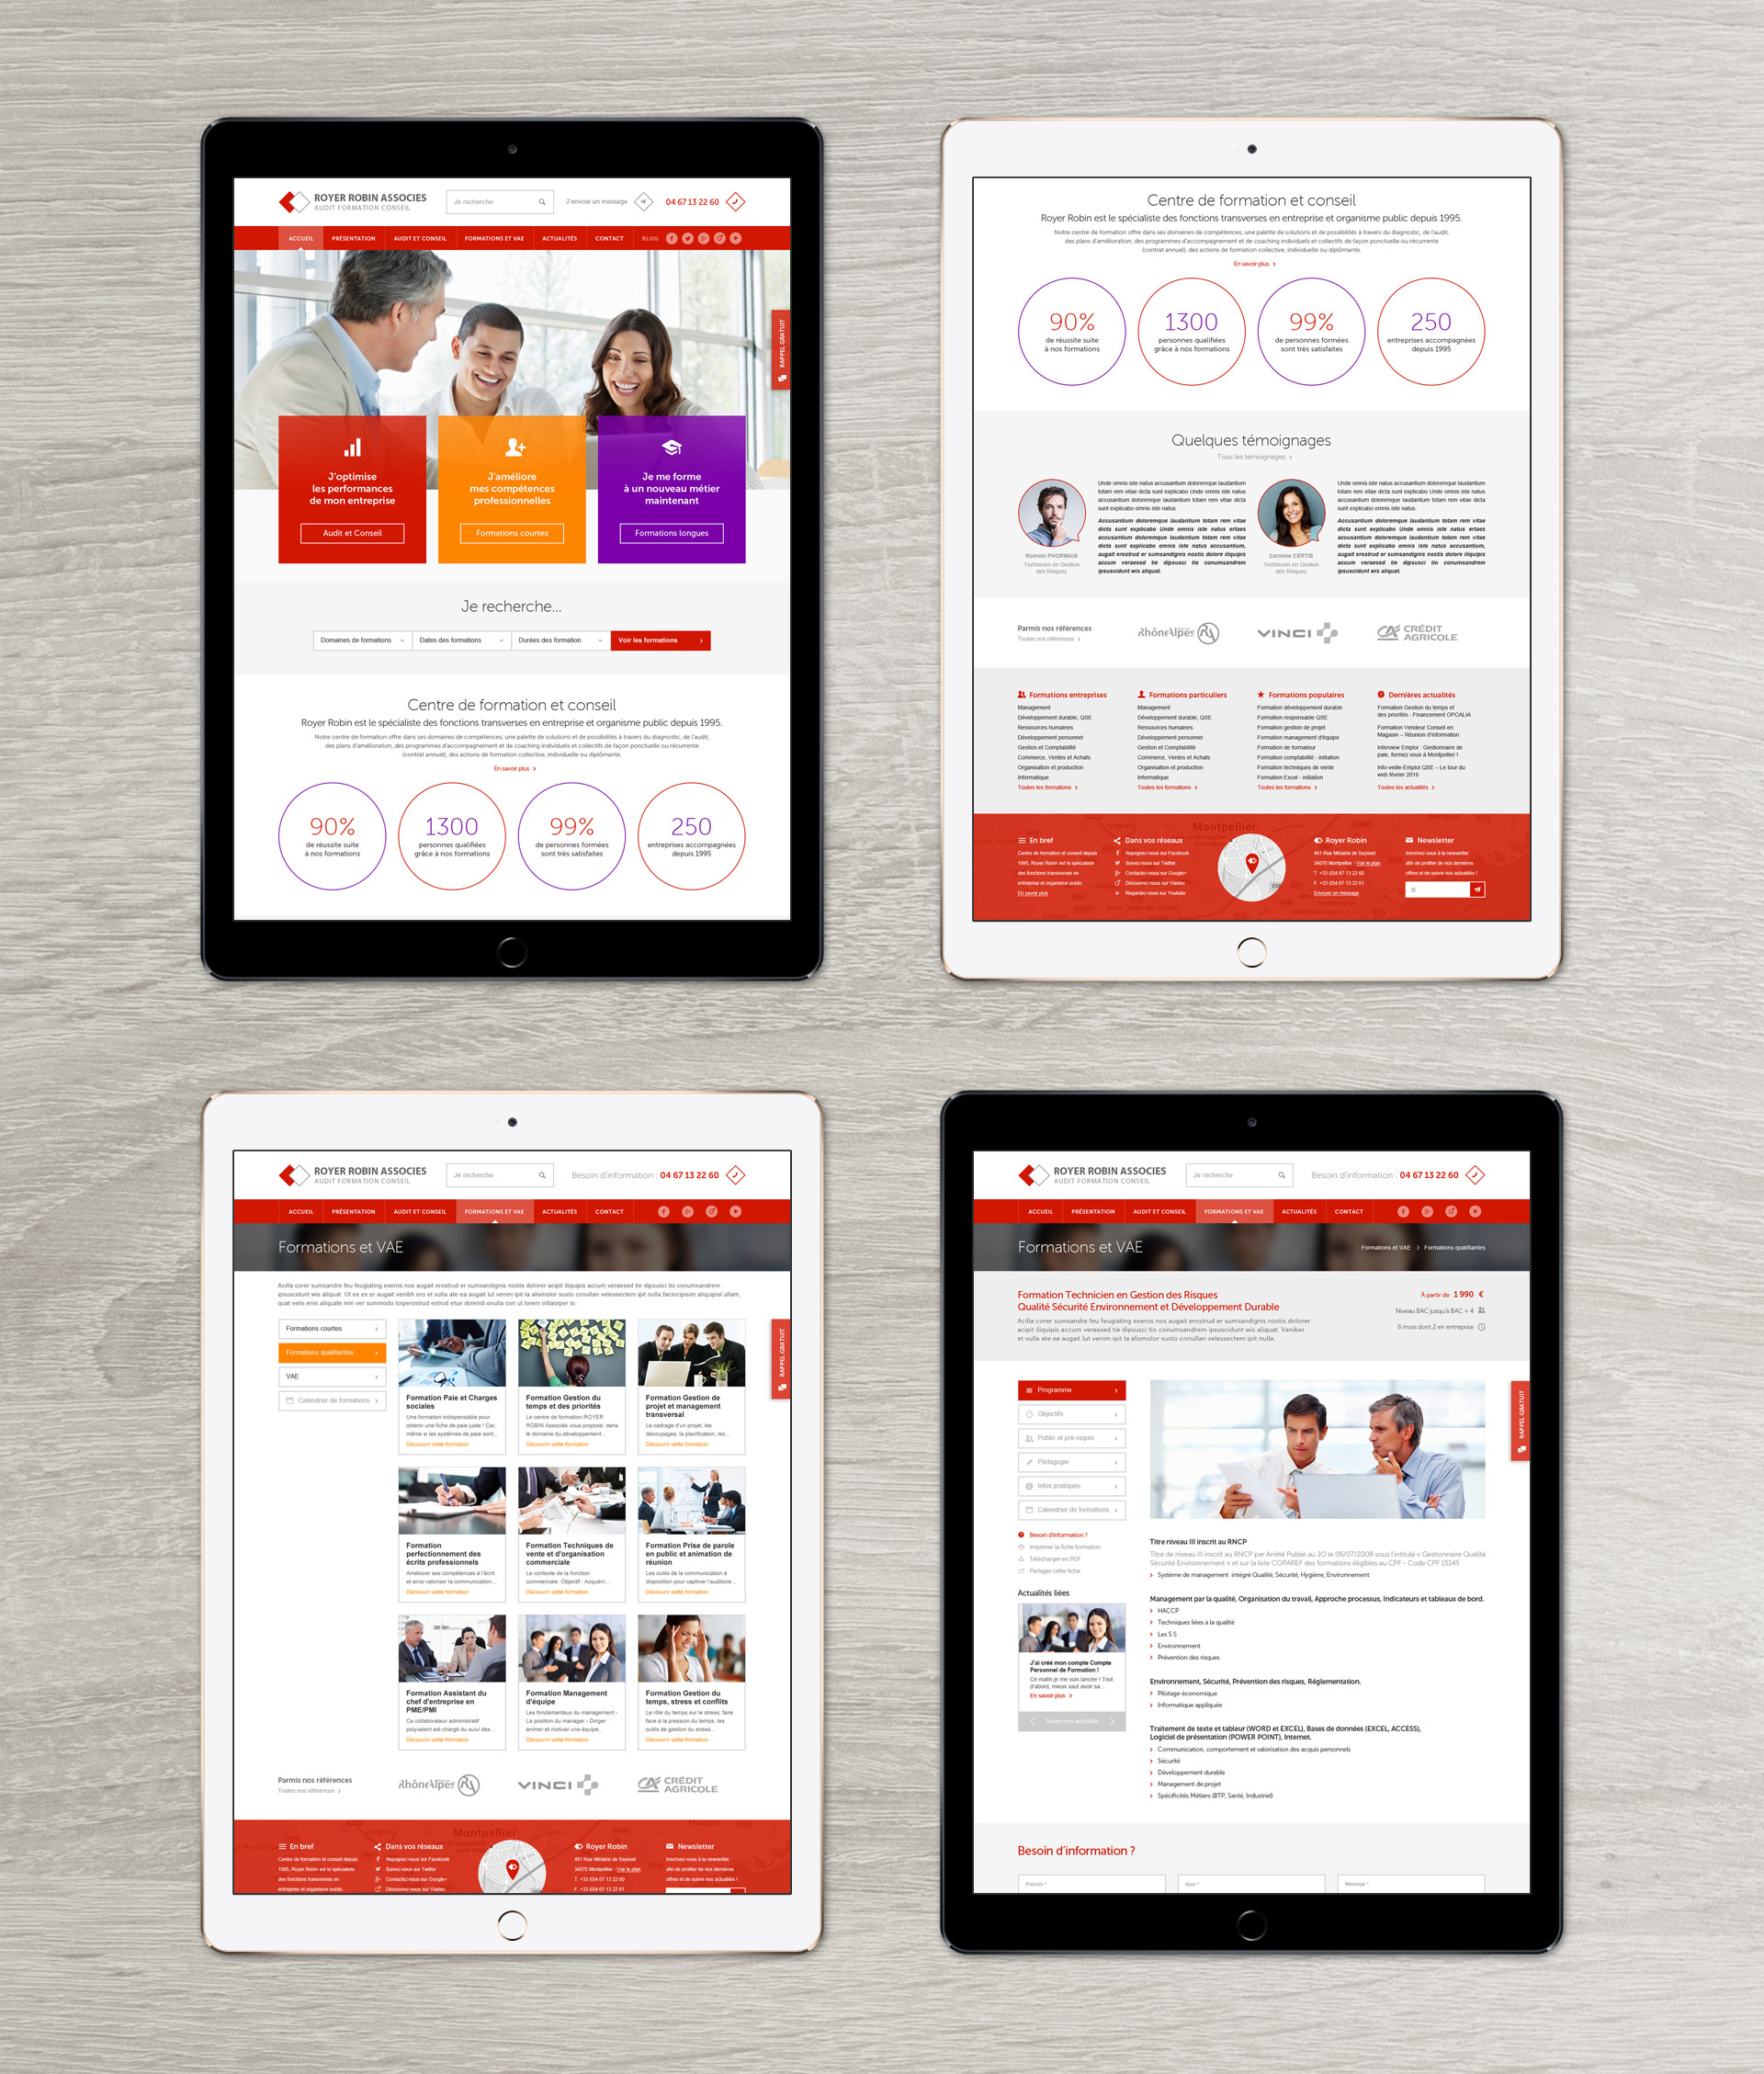 royer-robin-creation-site-internet-webdesign-responsive-design-caconcept-alexis-cretin-graphiste-montpellier